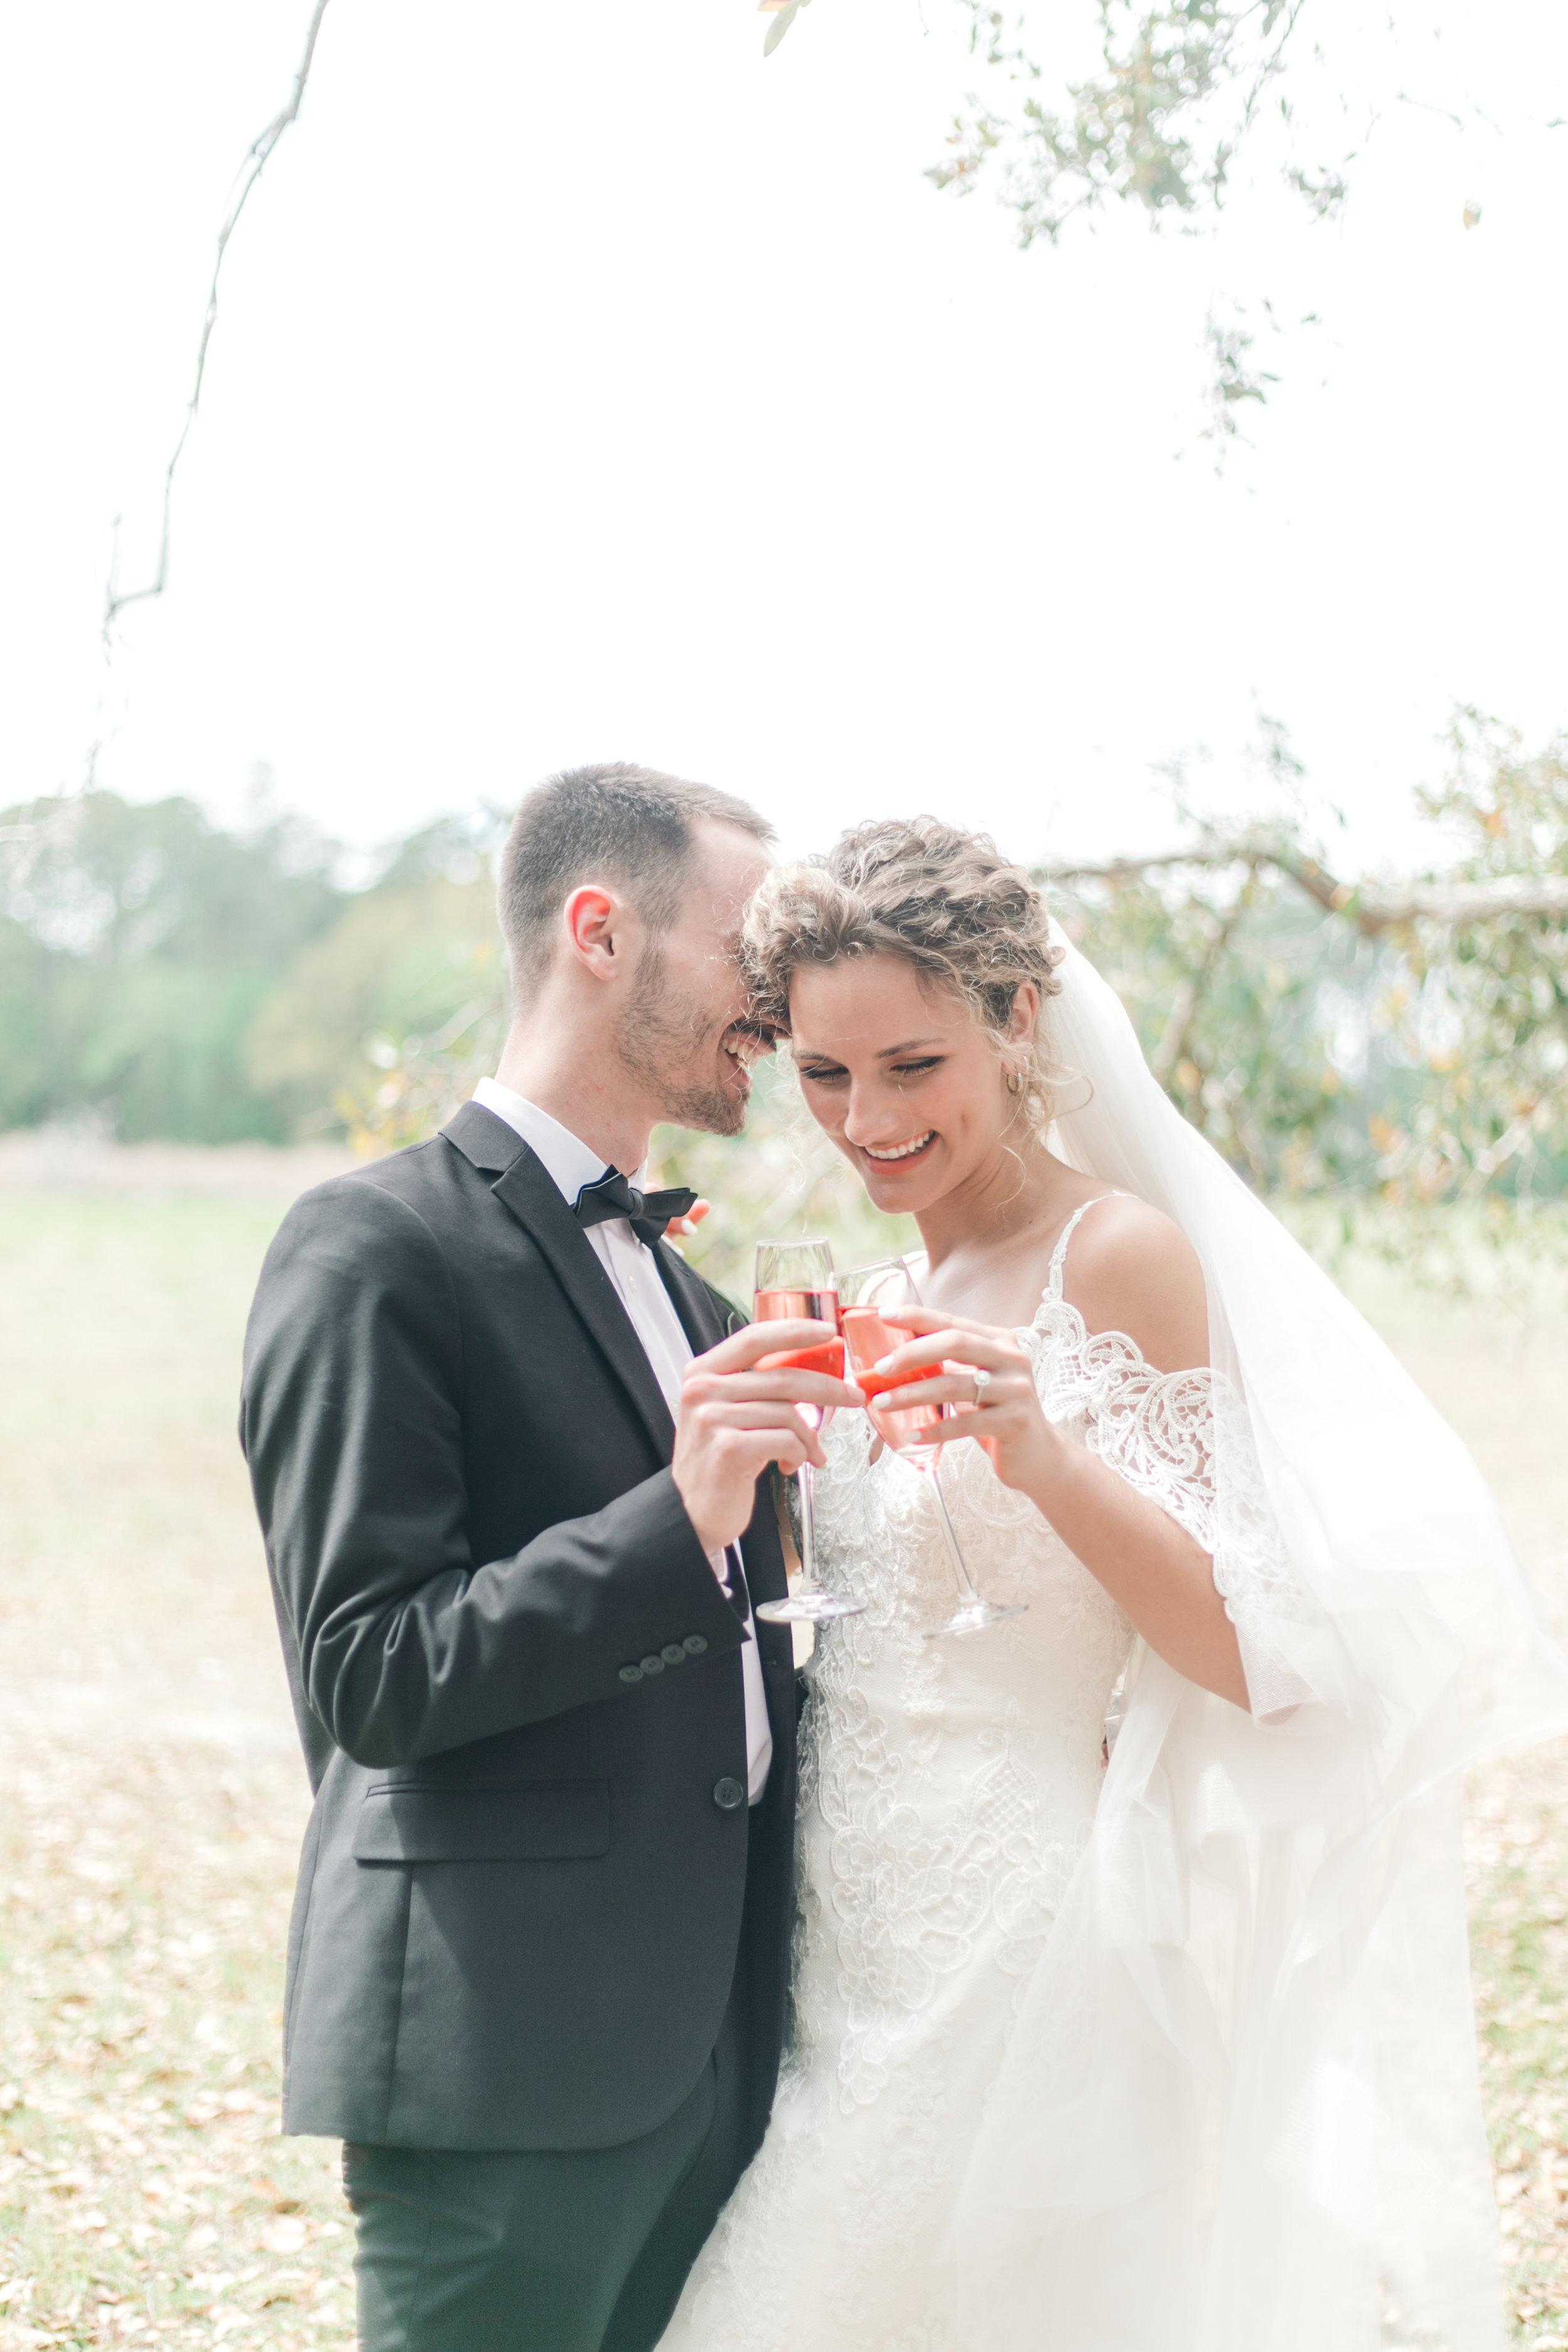 champagne-toast-wormsloe-historic-park-elopements-wormsloe-weddings-savannah-wedding-dresses-maggie-sottero-elliana-off-the-shoulder-wedding-dress.jpg